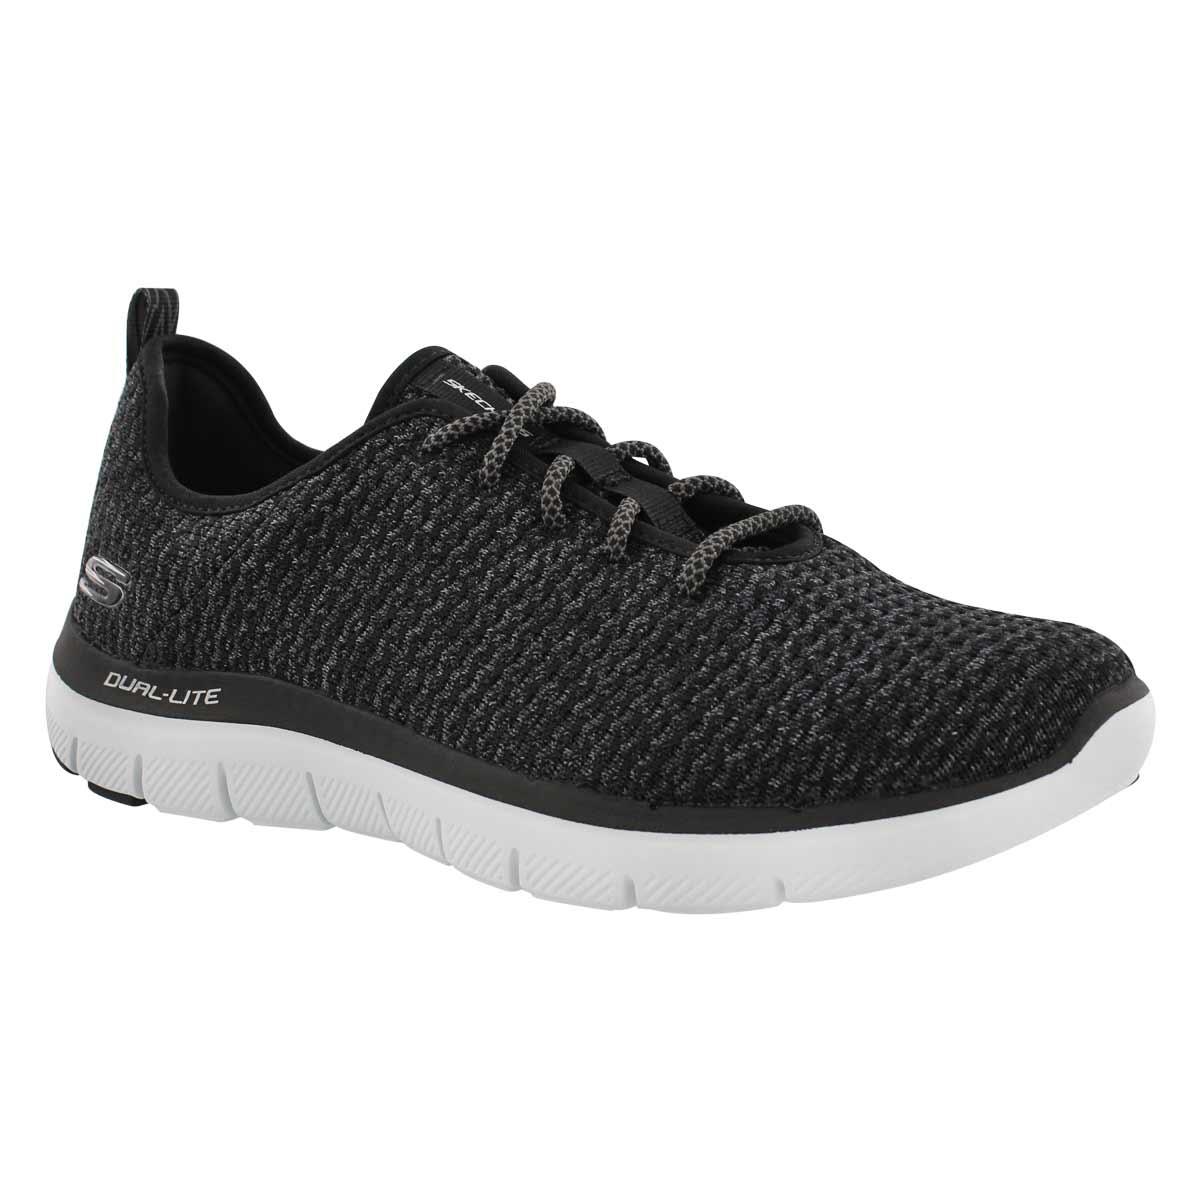 Men's FLEX ADVANTAGE 2.0 CRAVY black sneakers